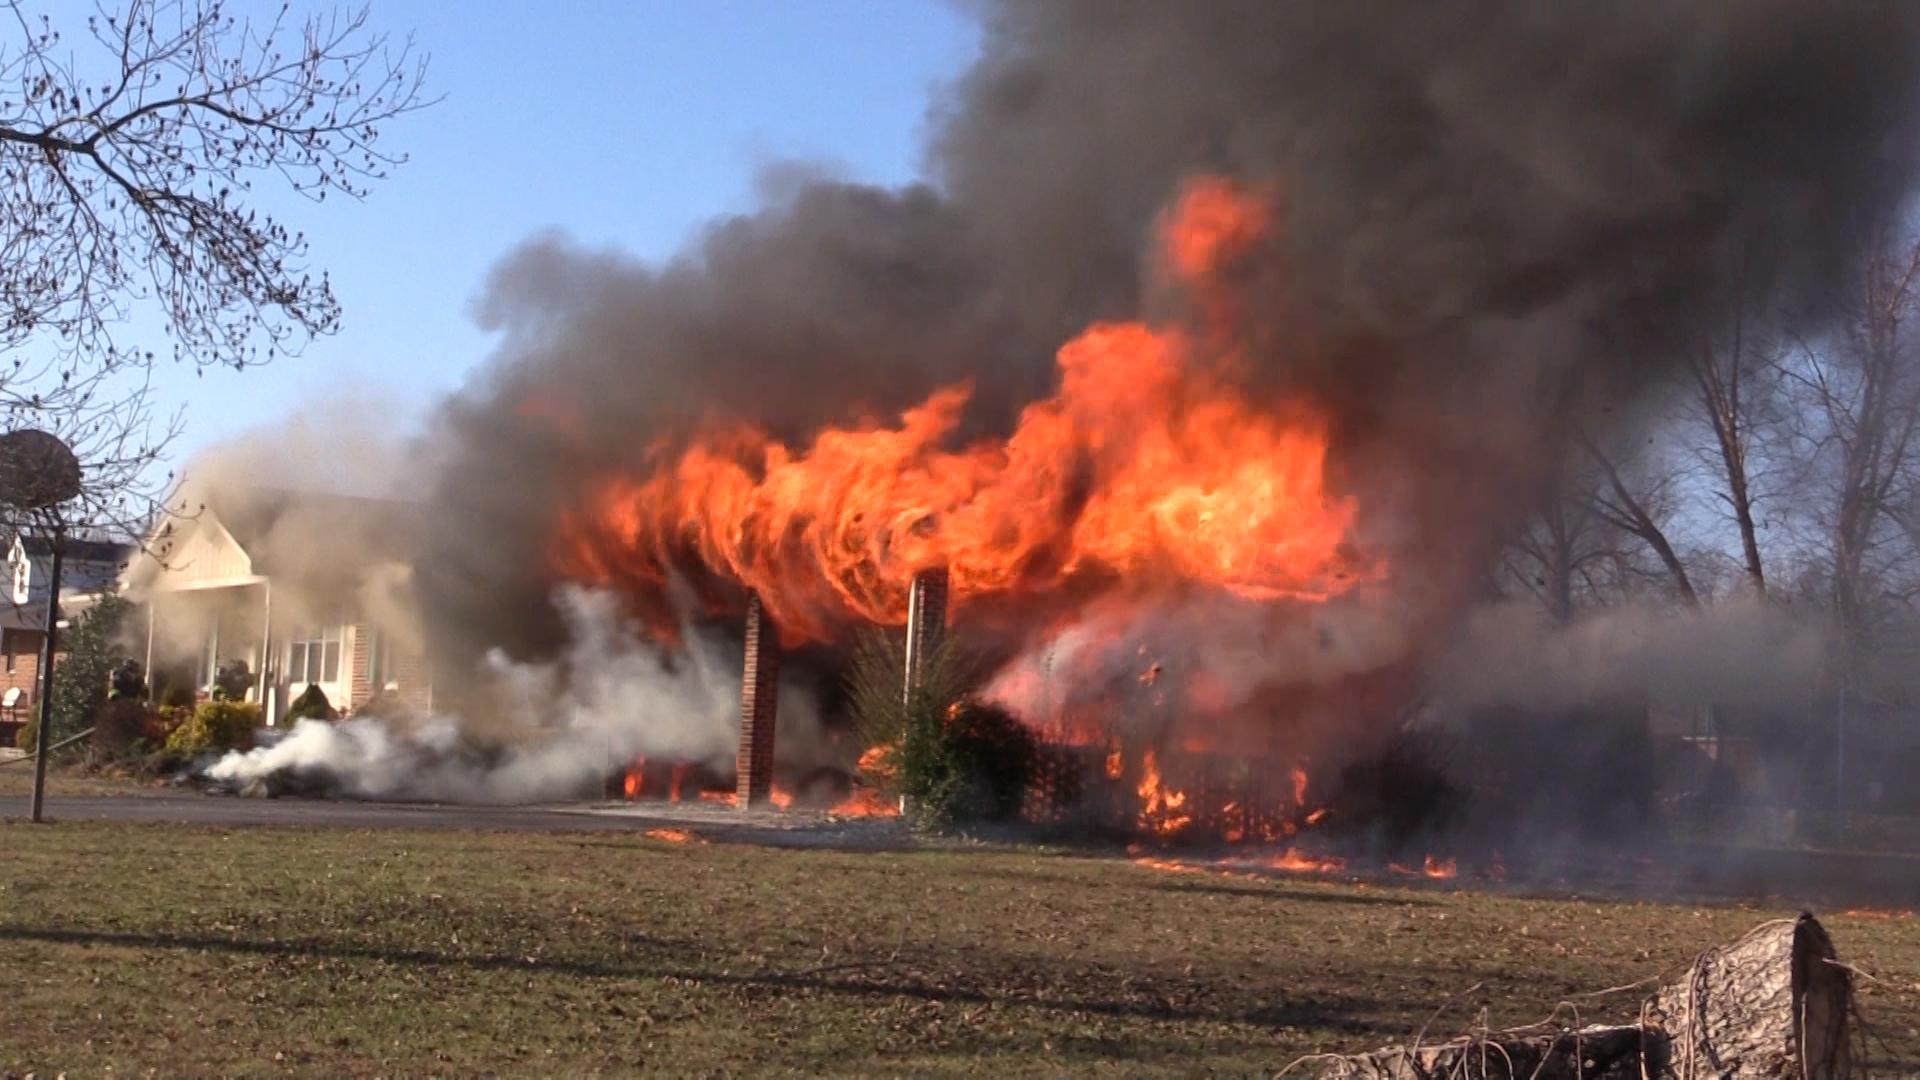 VIDEO - Home burns on C. Rody